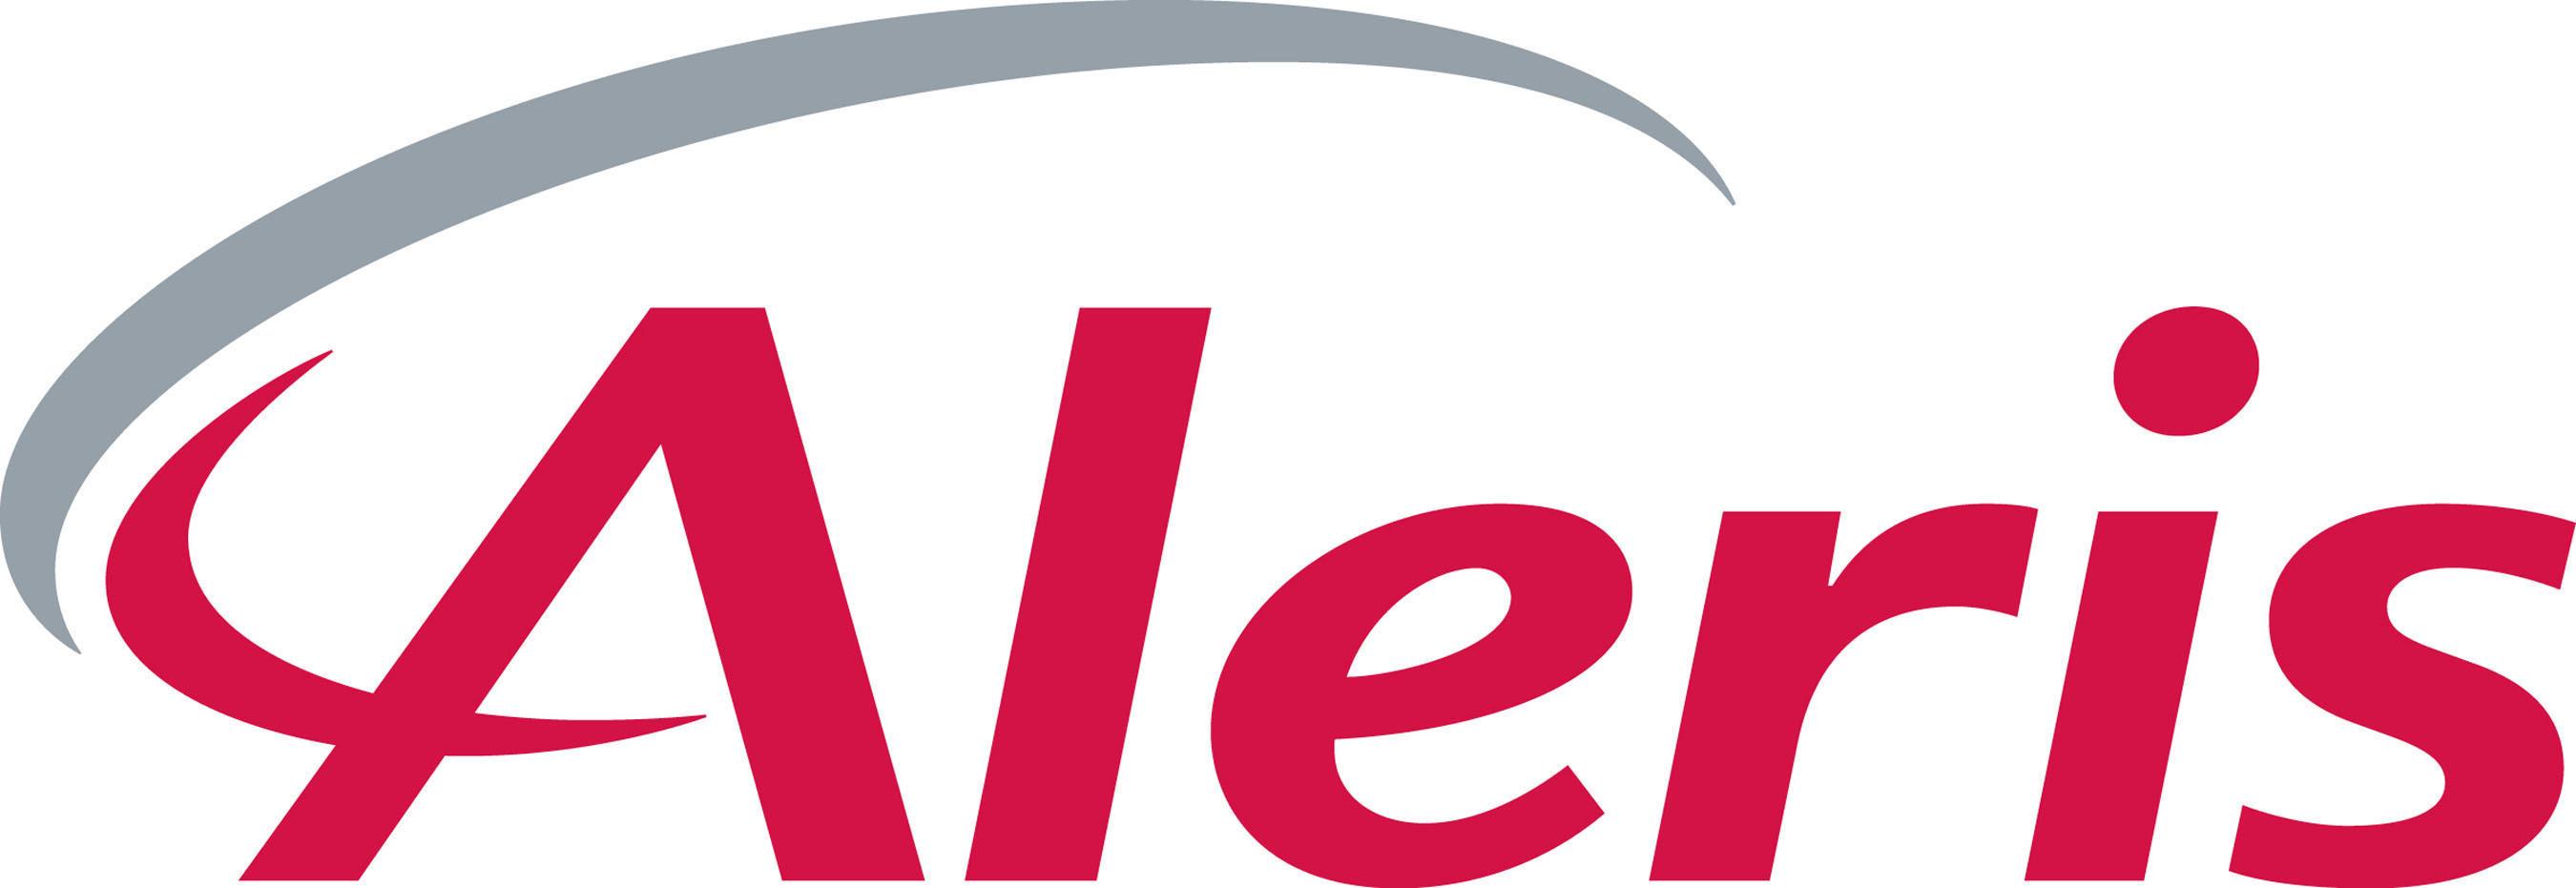 The Aleris Corporation. (PRNewsFoto/Aleris) (PRNewsFoto/ALERIS)